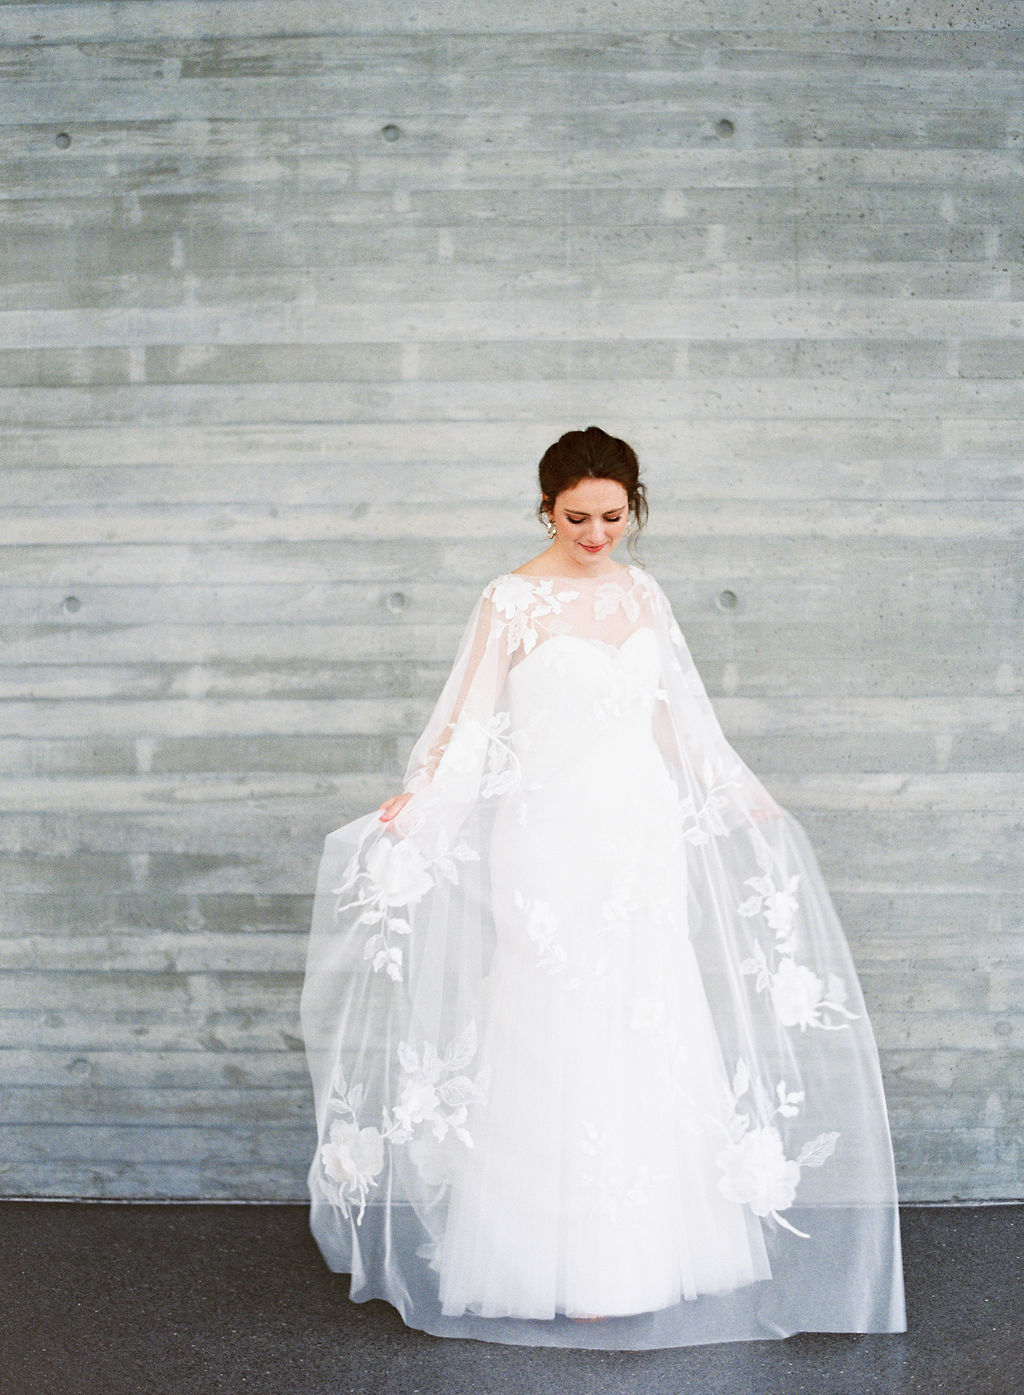 wedding-dress-cape-samanthajoyevents-louisville-jennapowers-speedmuseums.jpg